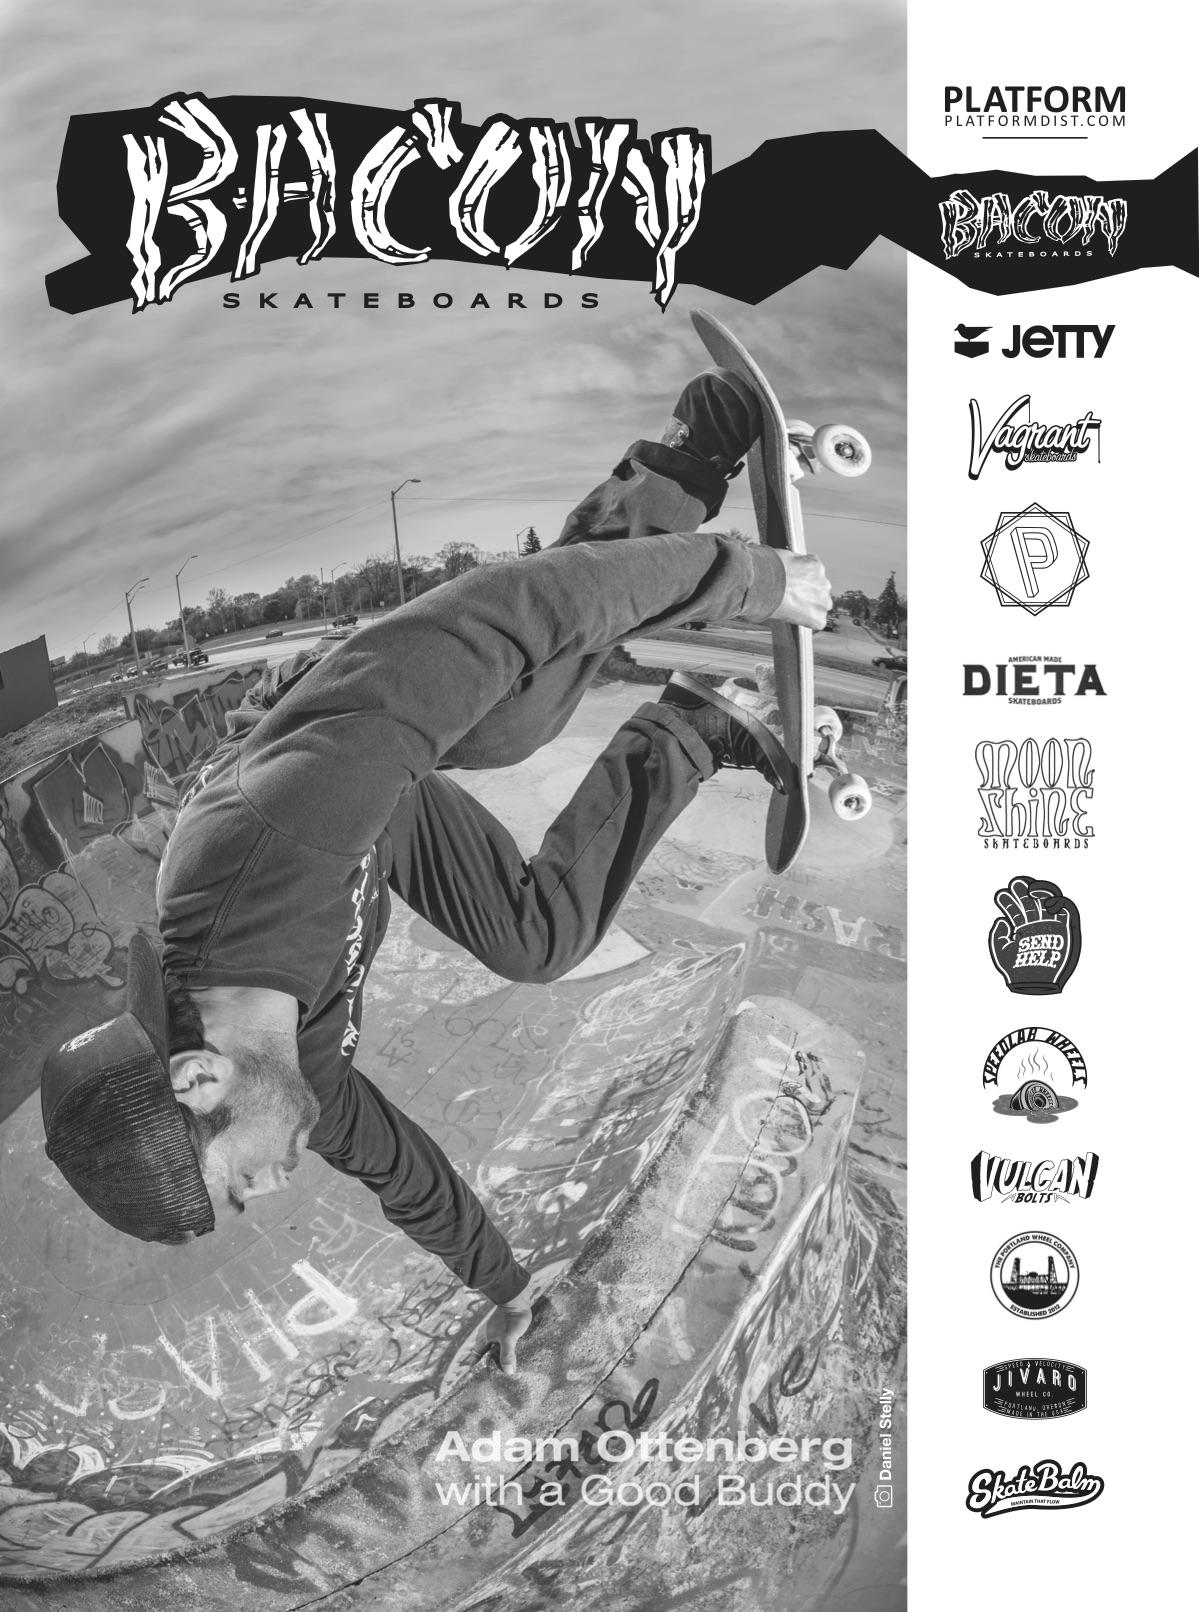 Bacon Skateboards ad in The Tubuloids Flexizine